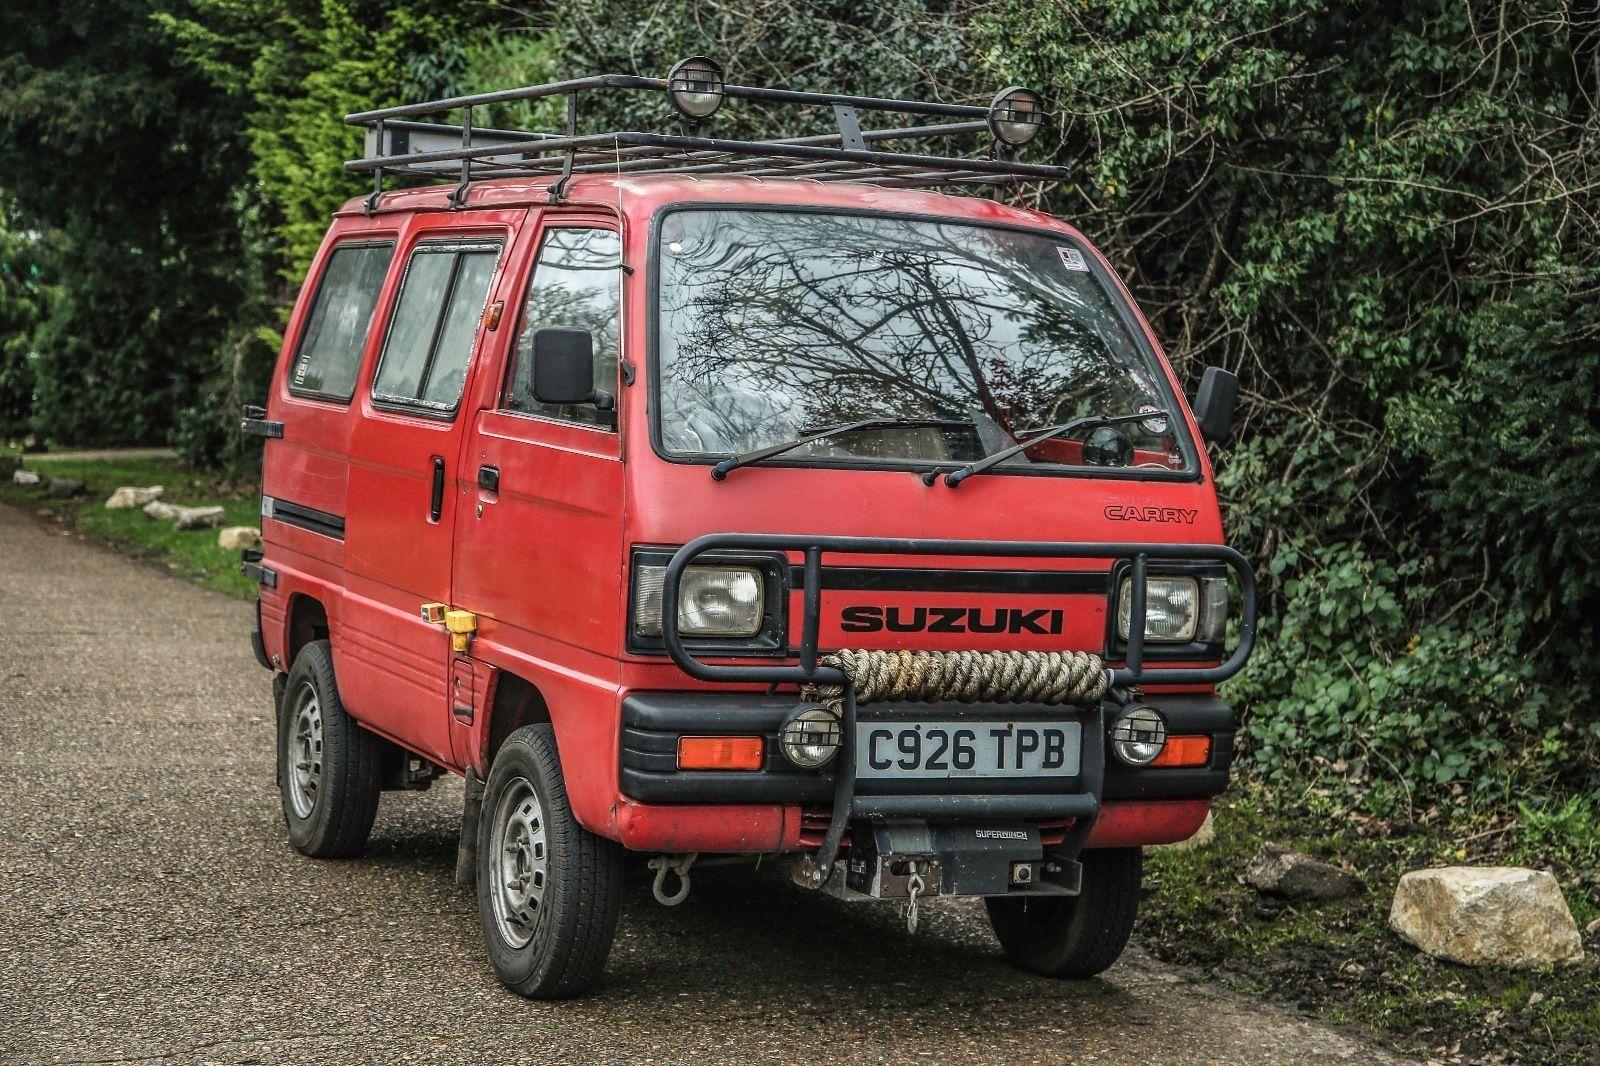 1986 Suzuki Supercarry Rascal Expedition Overland Van With Lpg Suzuki Carry Mini Van Suzuki